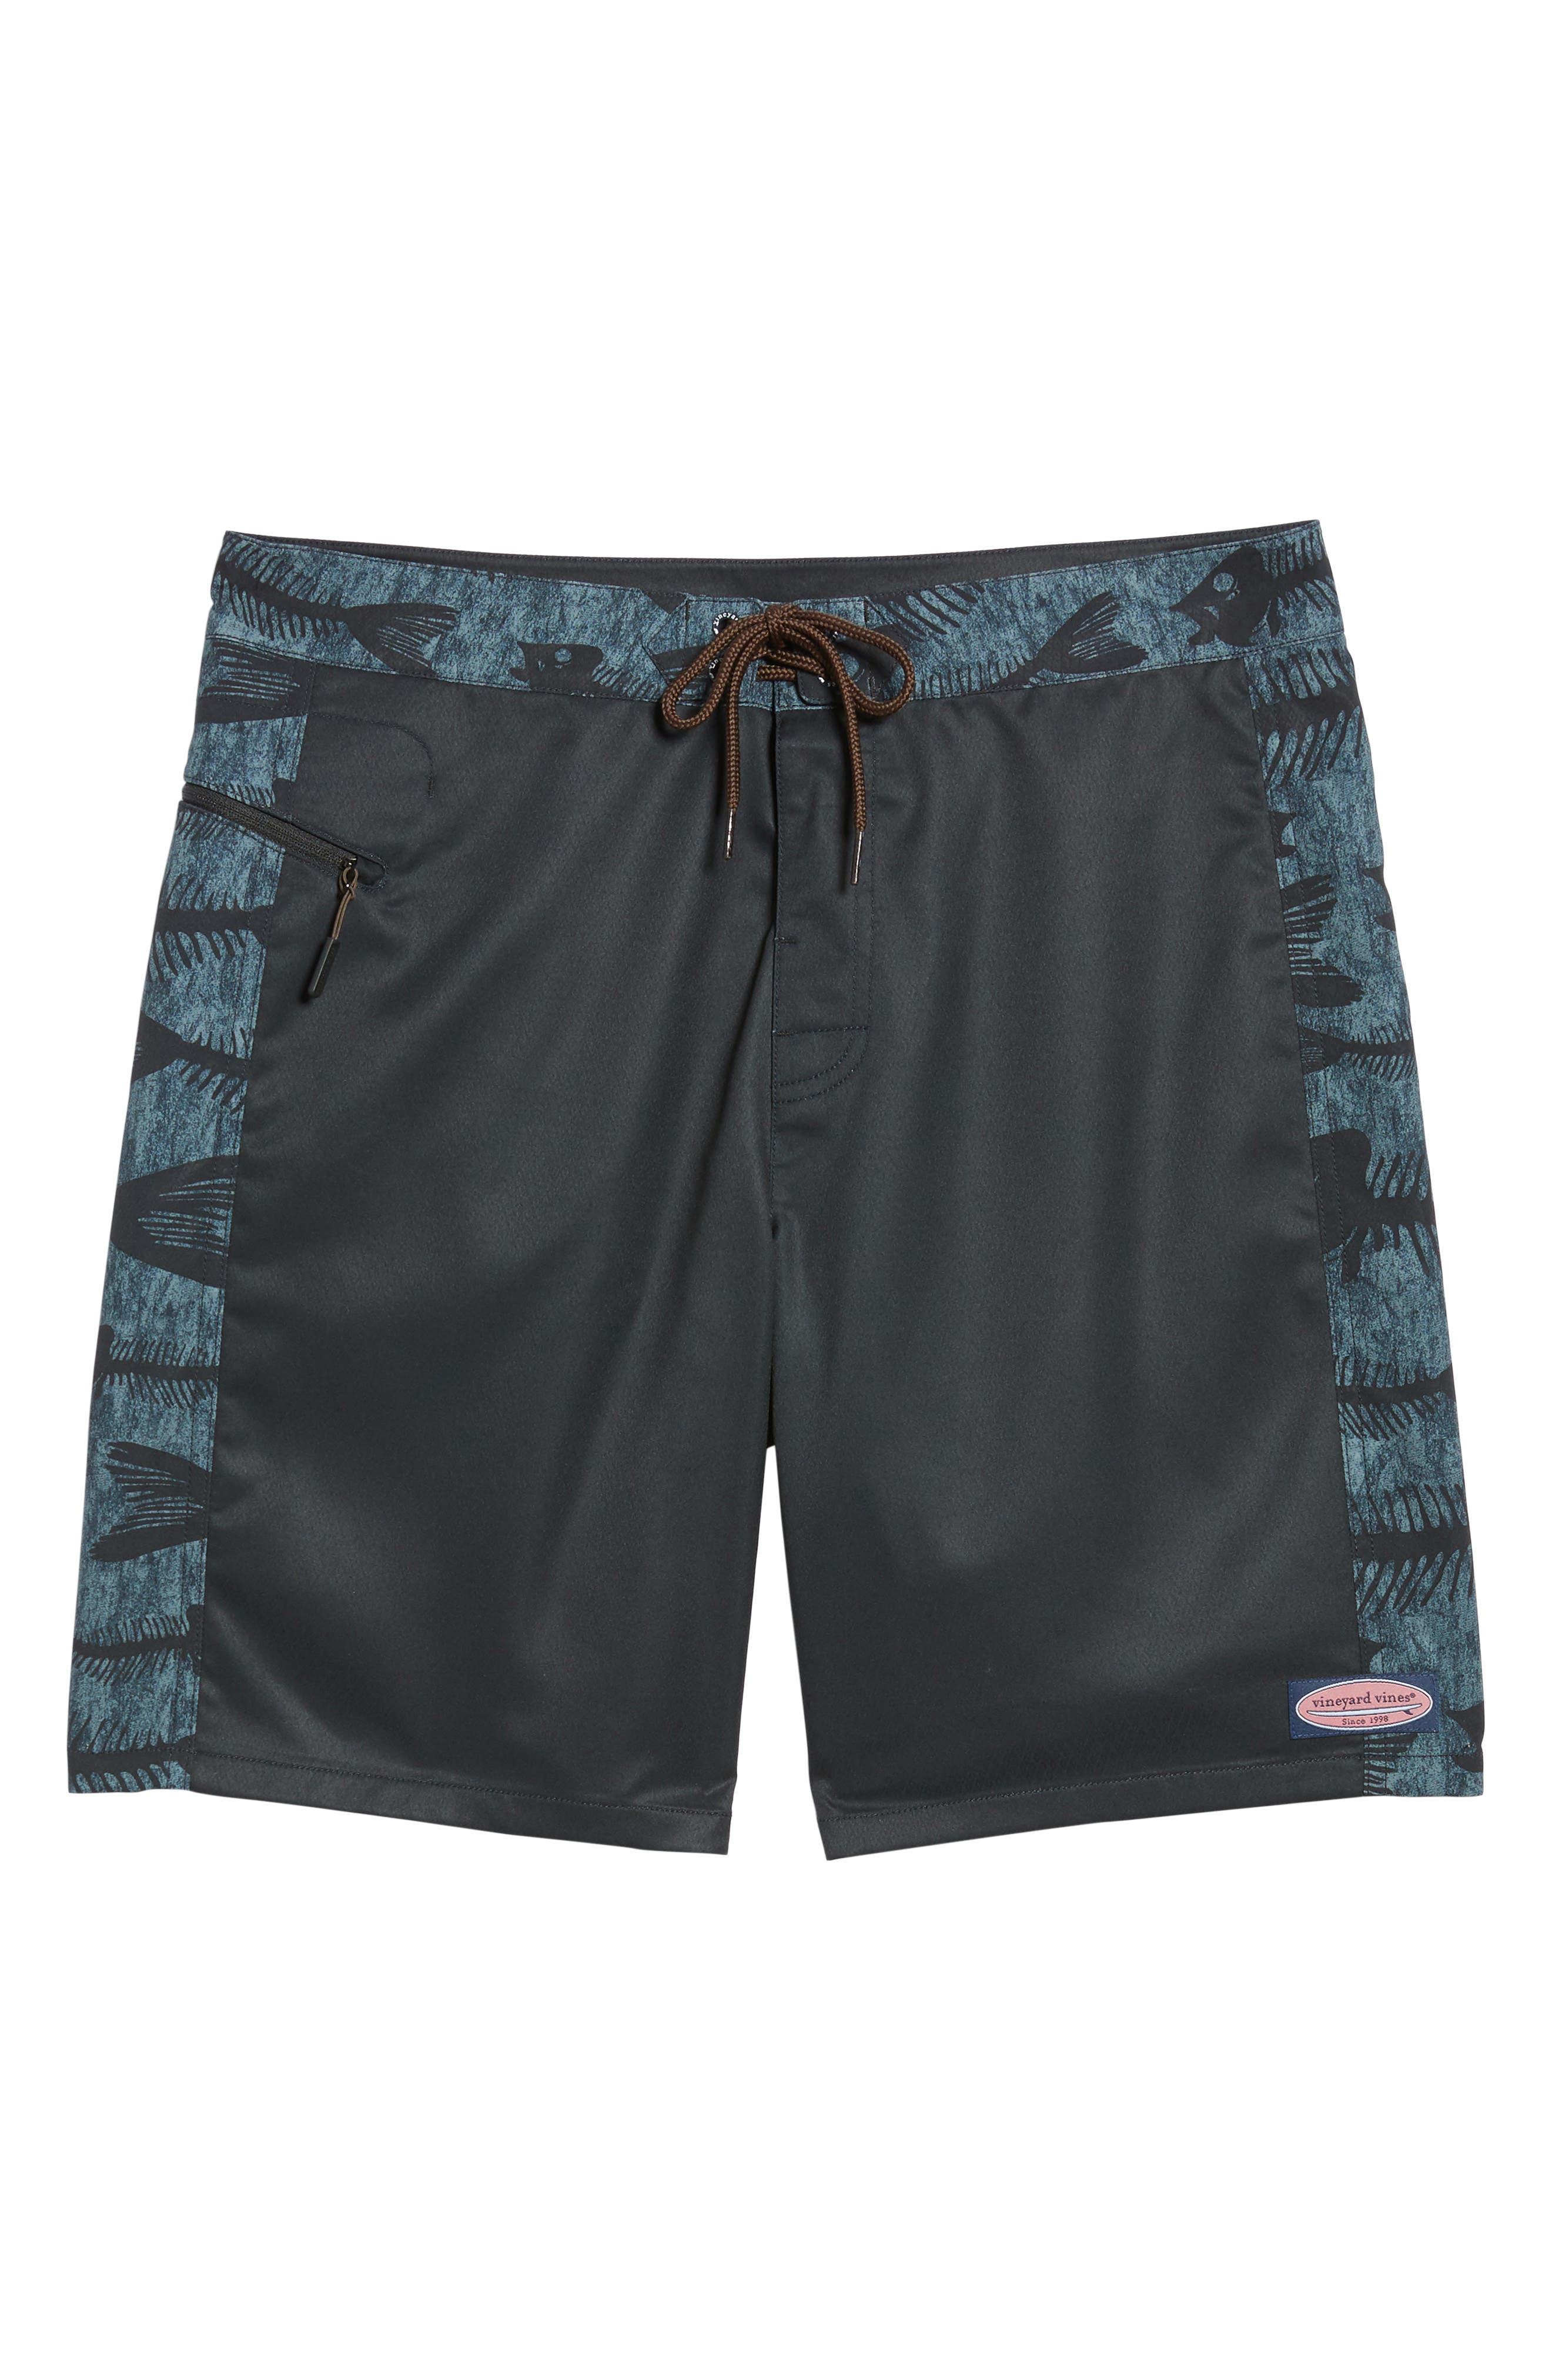 Bonefish Board Shorts,                             Alternate thumbnail 6, color,                             020